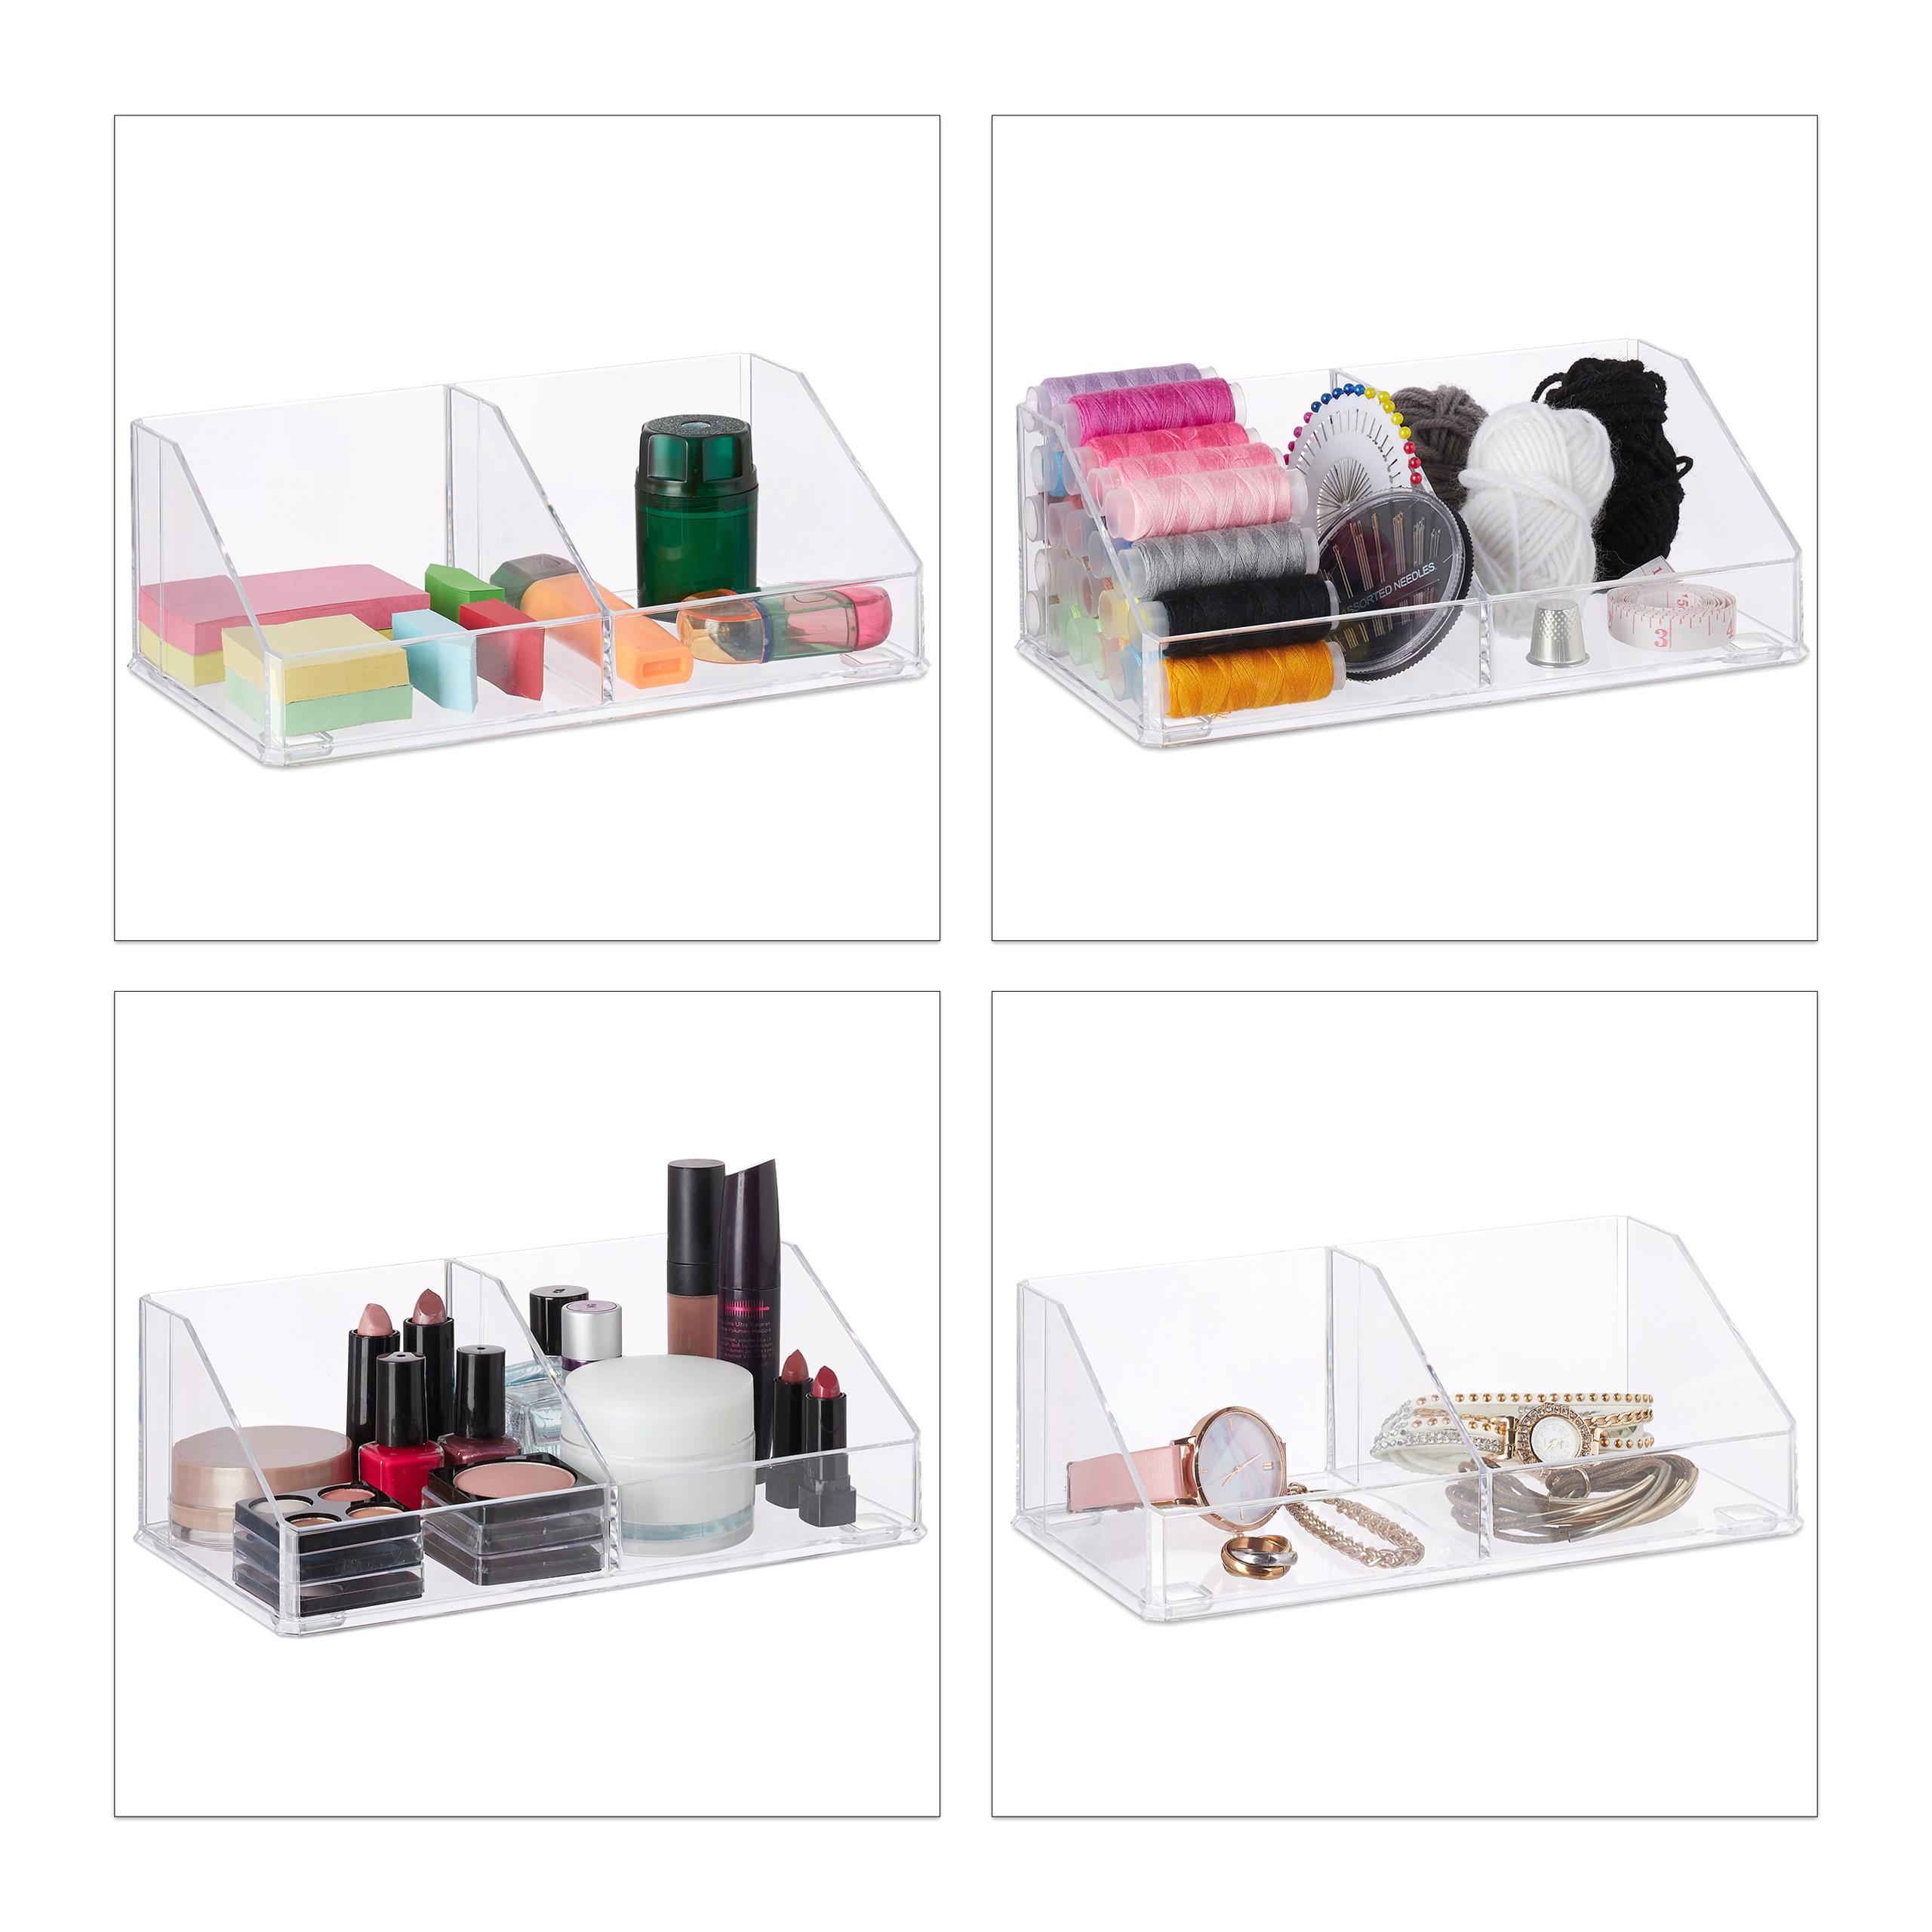 make-up-organizer-cosmetica-organizer-acryl-2-vakken-badkamer-opbergen miniatuur 5